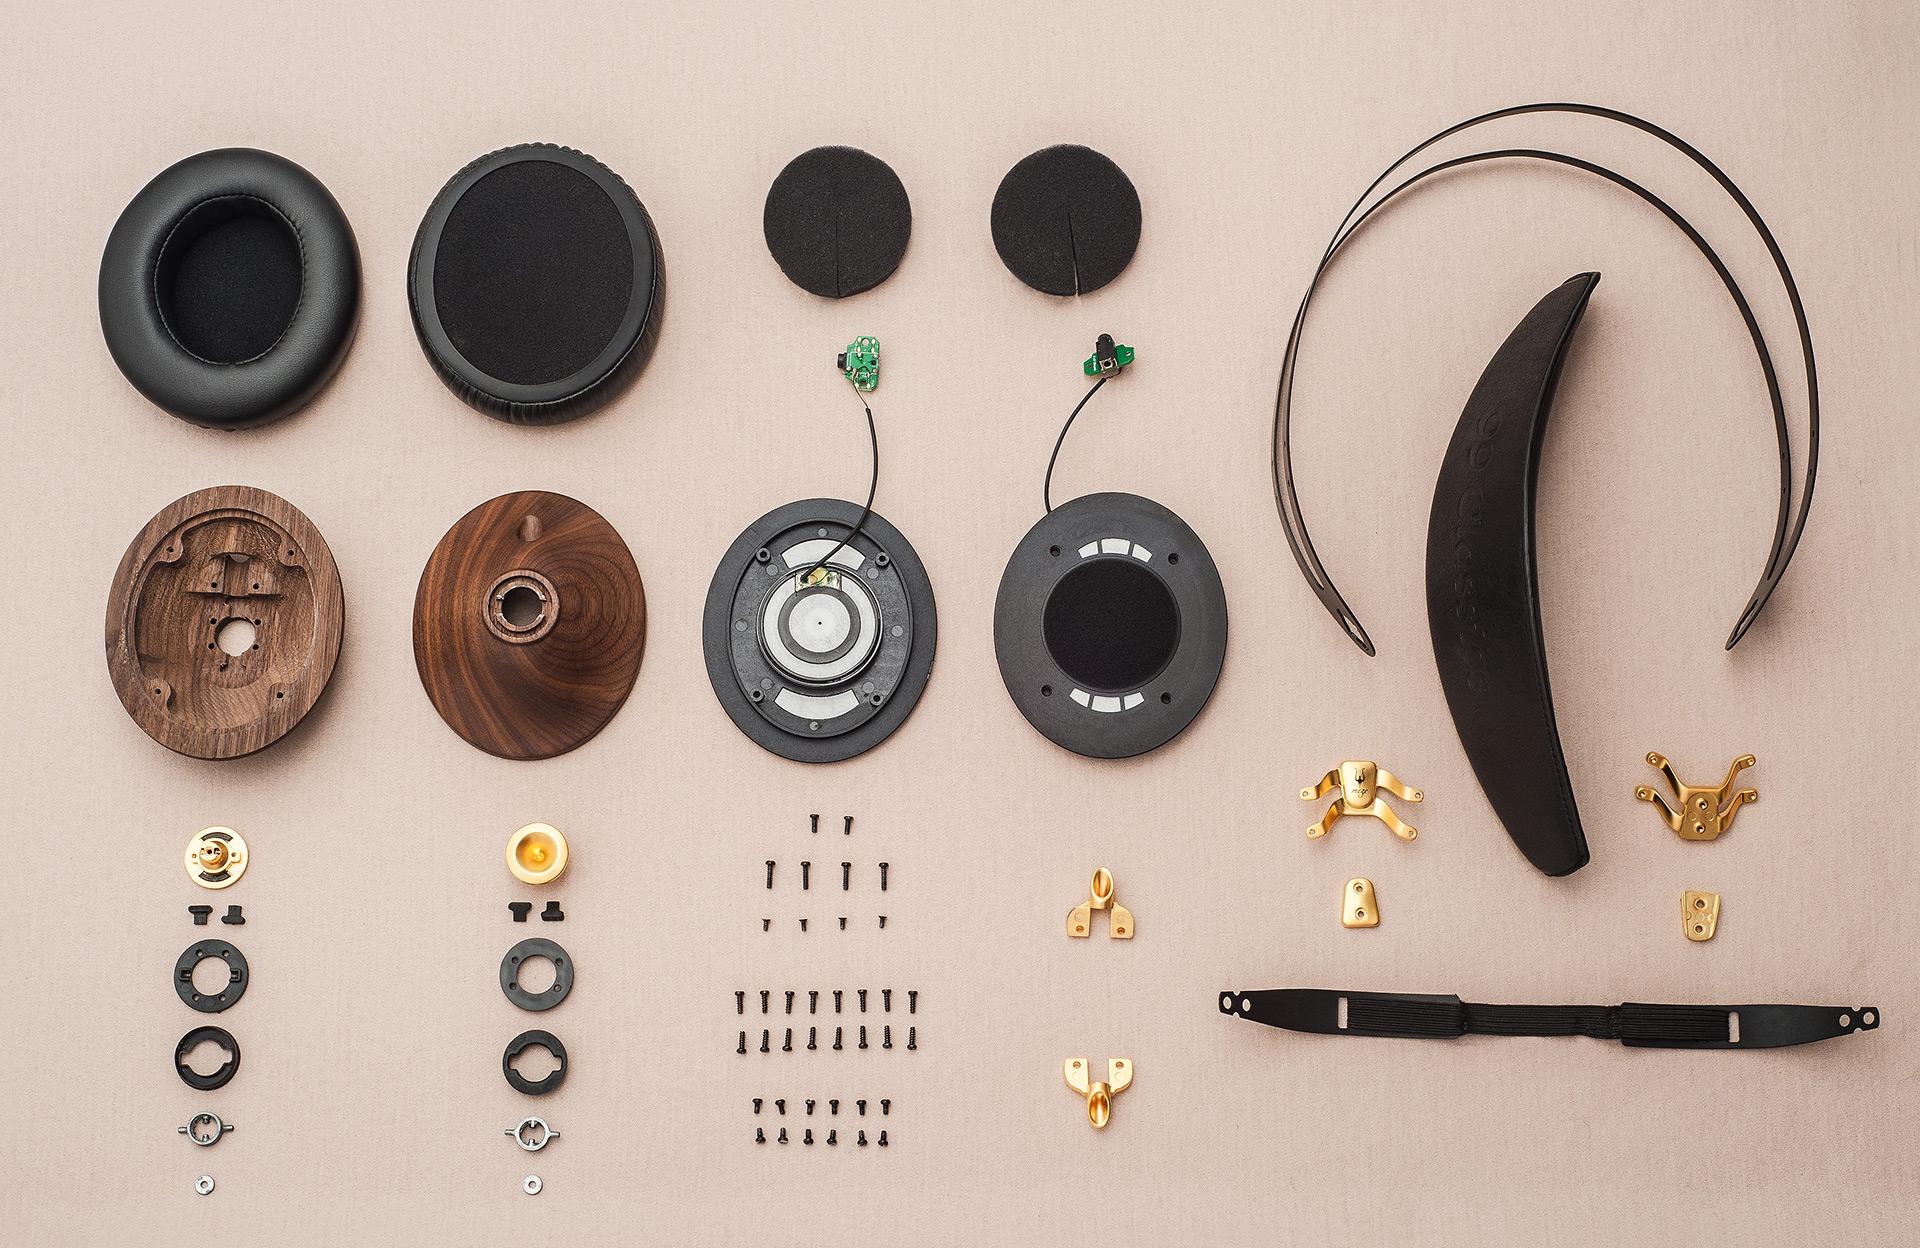 Meze Headphones creates the ultimate crafted wood premium